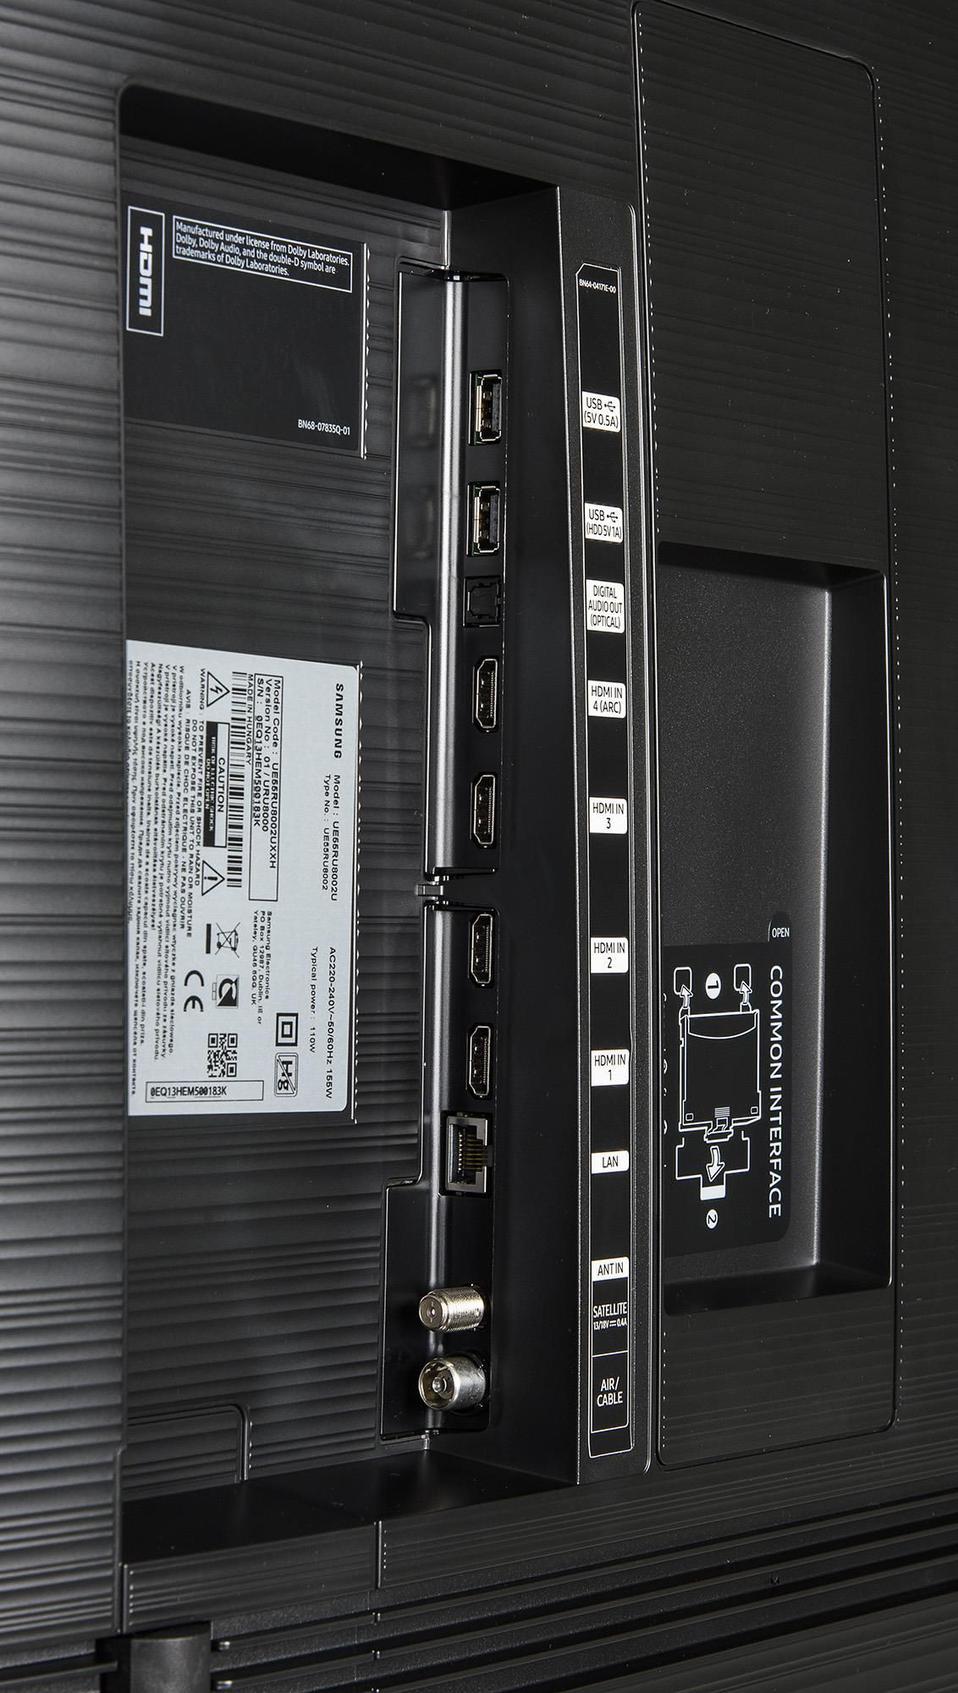 Samsung UE49RU8002 LED 49